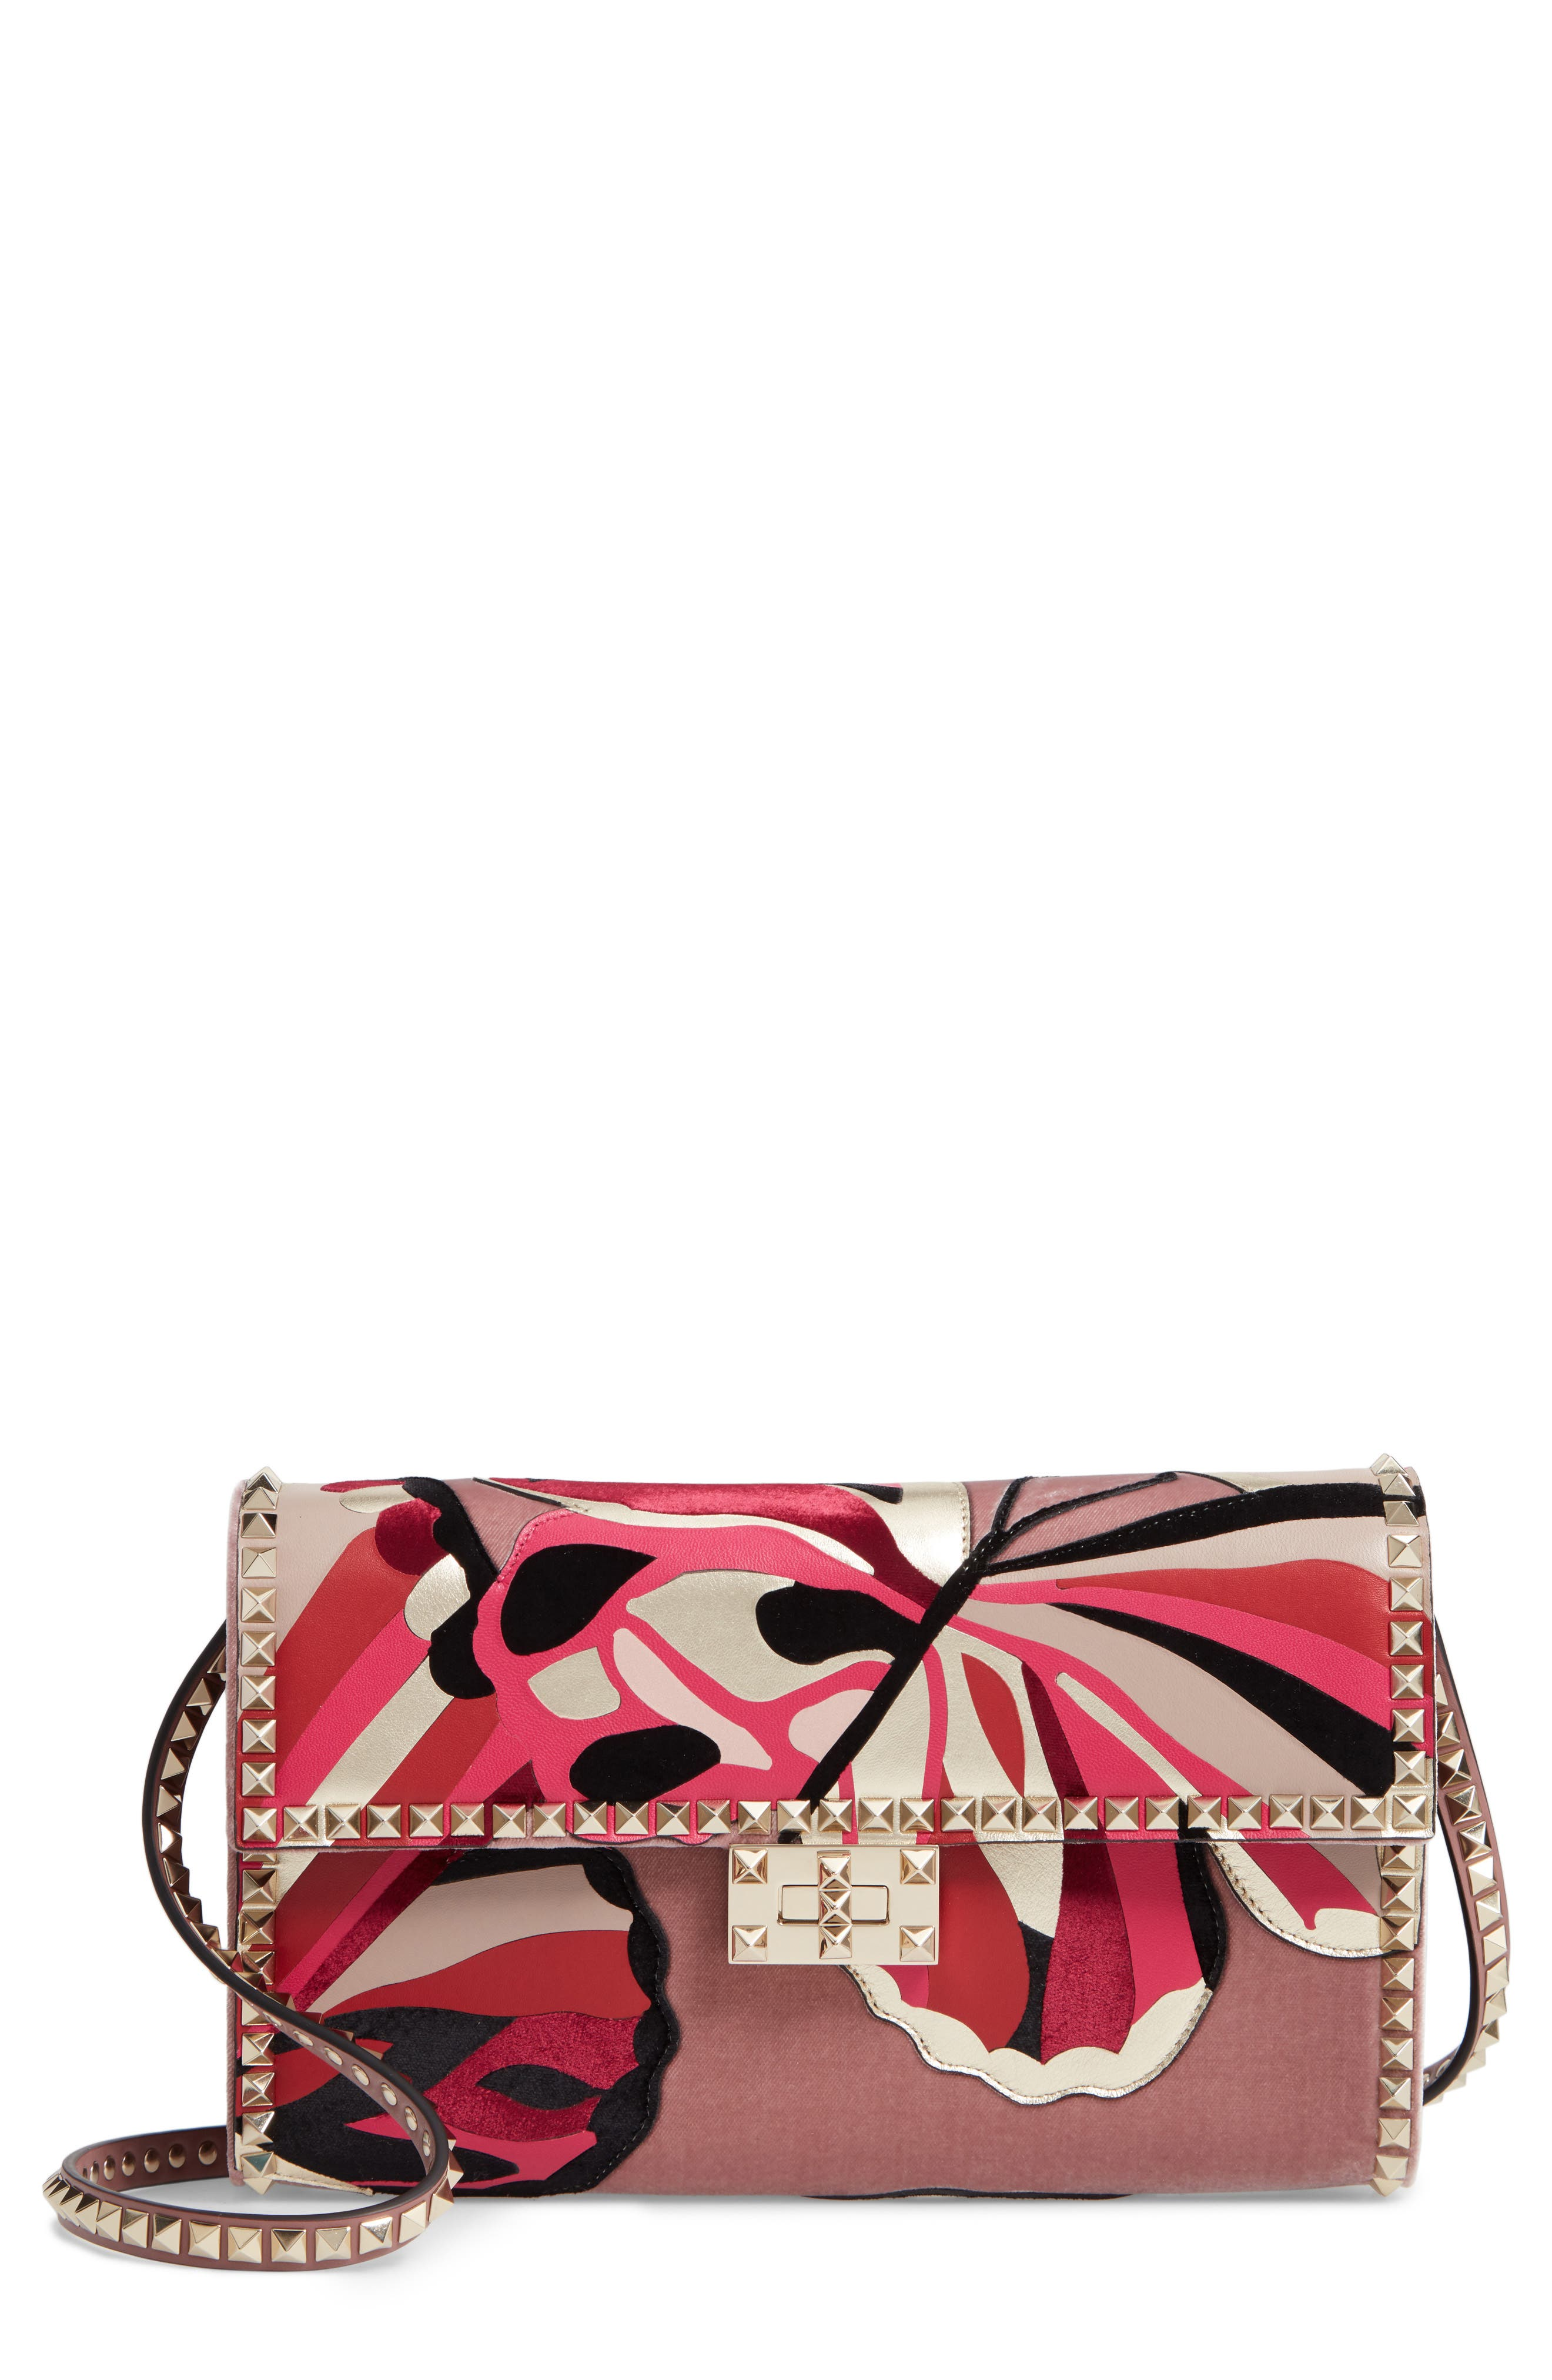 VALENTINO GARAVANI Patchwork Butterfly Leather & Textile Shoulder Bag, Main, color, LIP